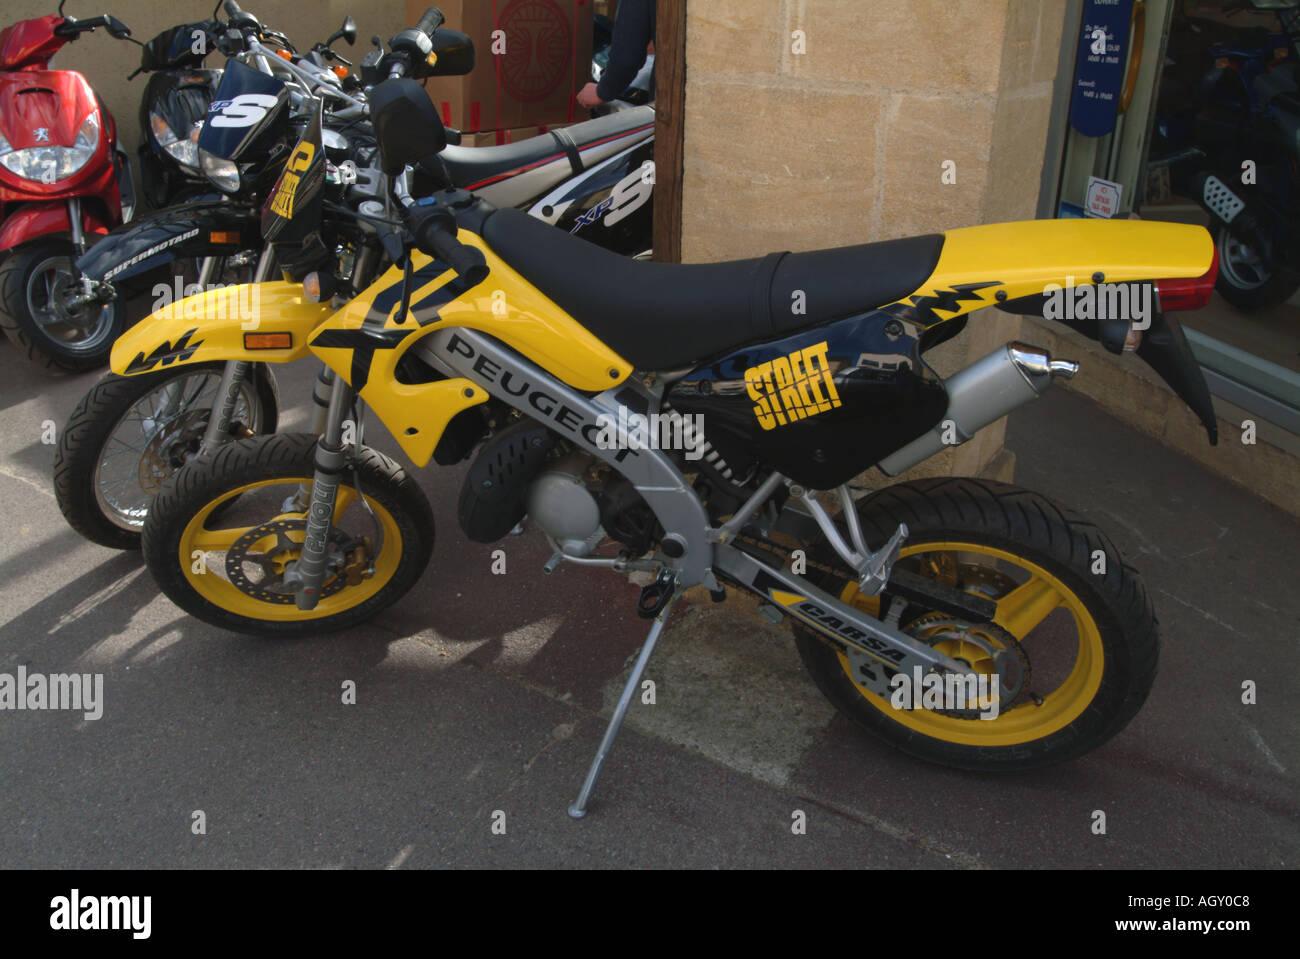 Motor bikes for sale France - Stock Image